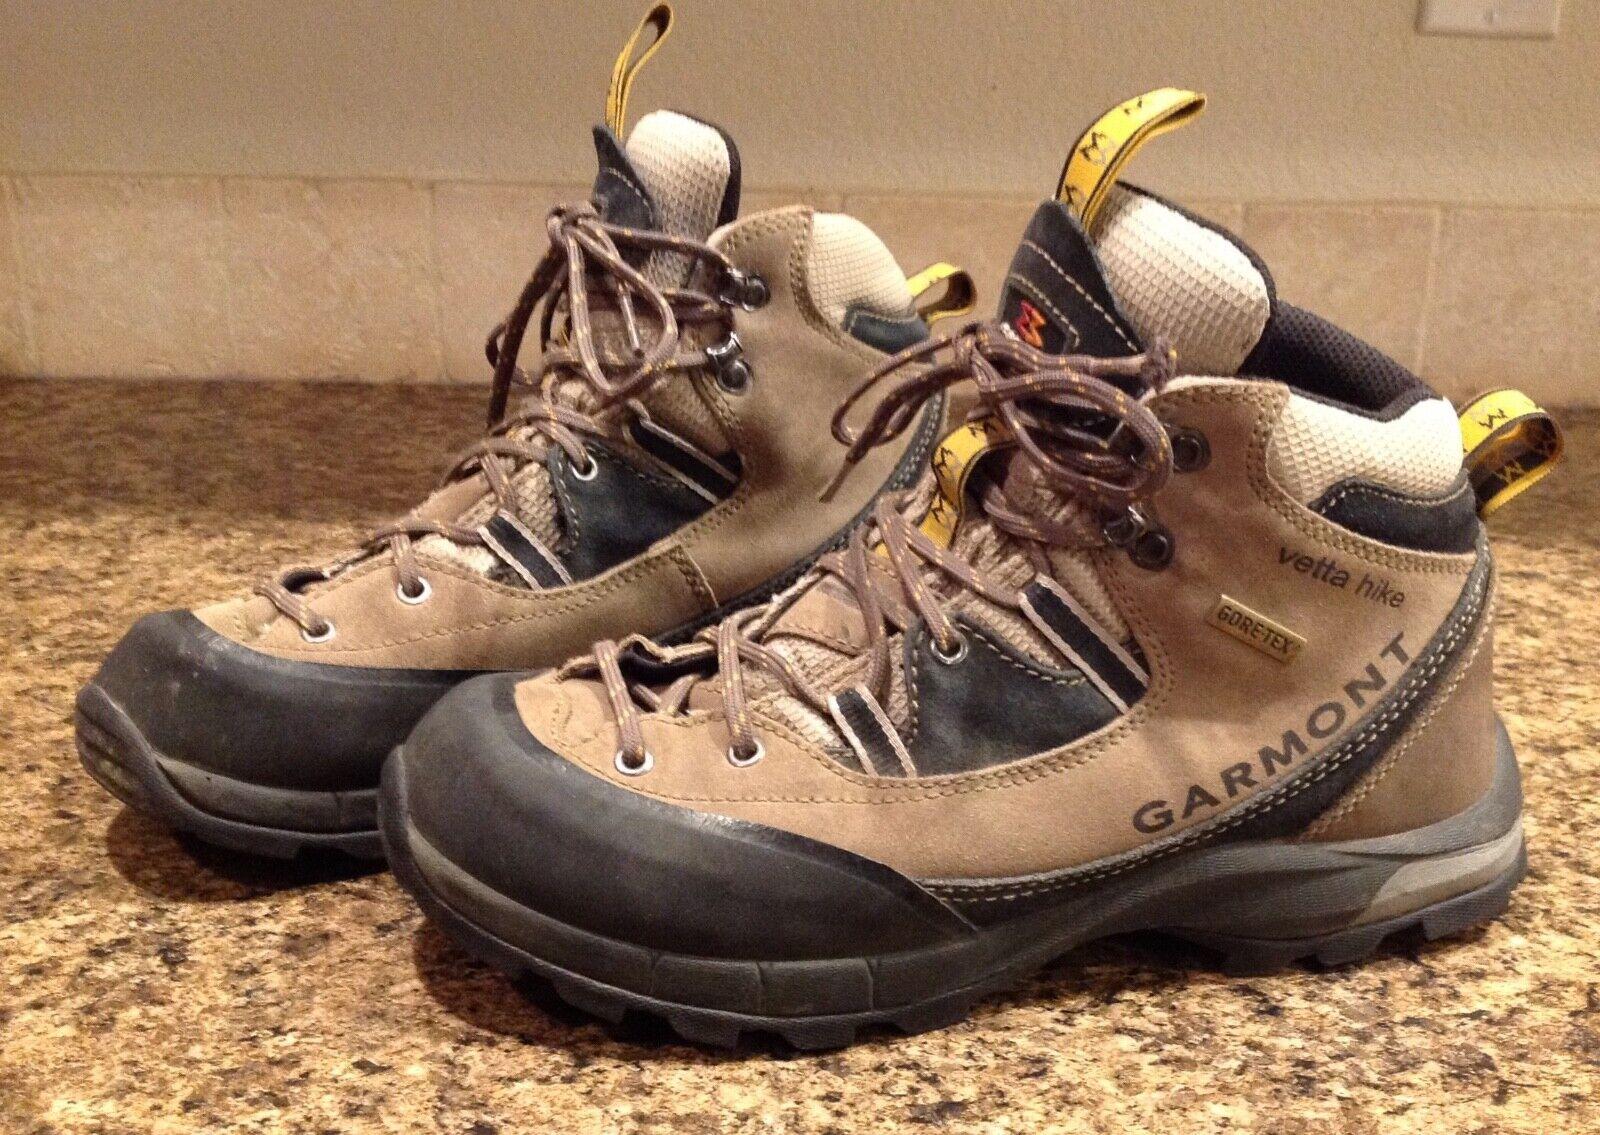 Garmont Vetta Hike Sz 9 Women's Gore-Tex Hiking Trail Mountaineering Boots Brown